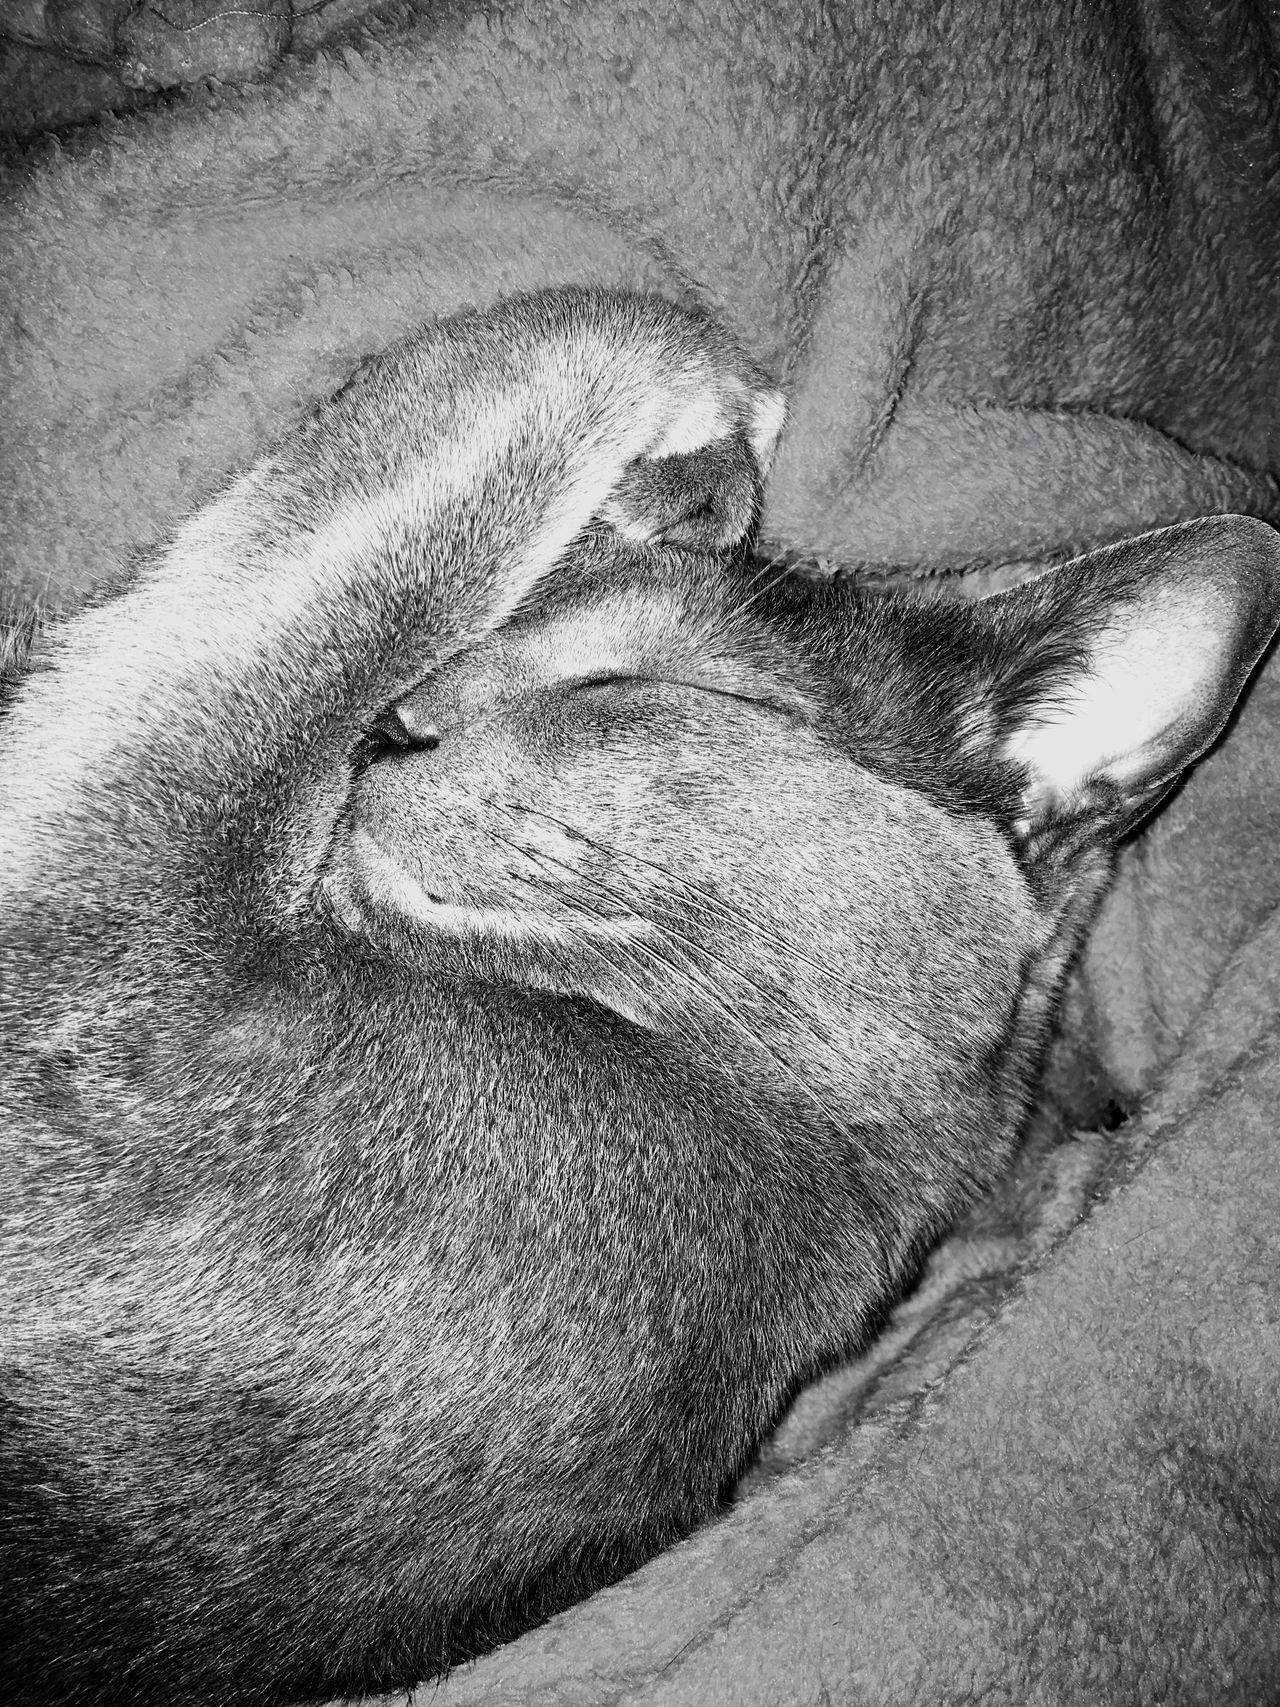 Sleeping beauty 😺 Mammal Animal Themes Domestic Animals One Animal Pets Sleeping Relaxation No People Indoors  Lying Down Close-up Feline Day RussianBlue Cat♡ Russianblues Tardis TardistheCat